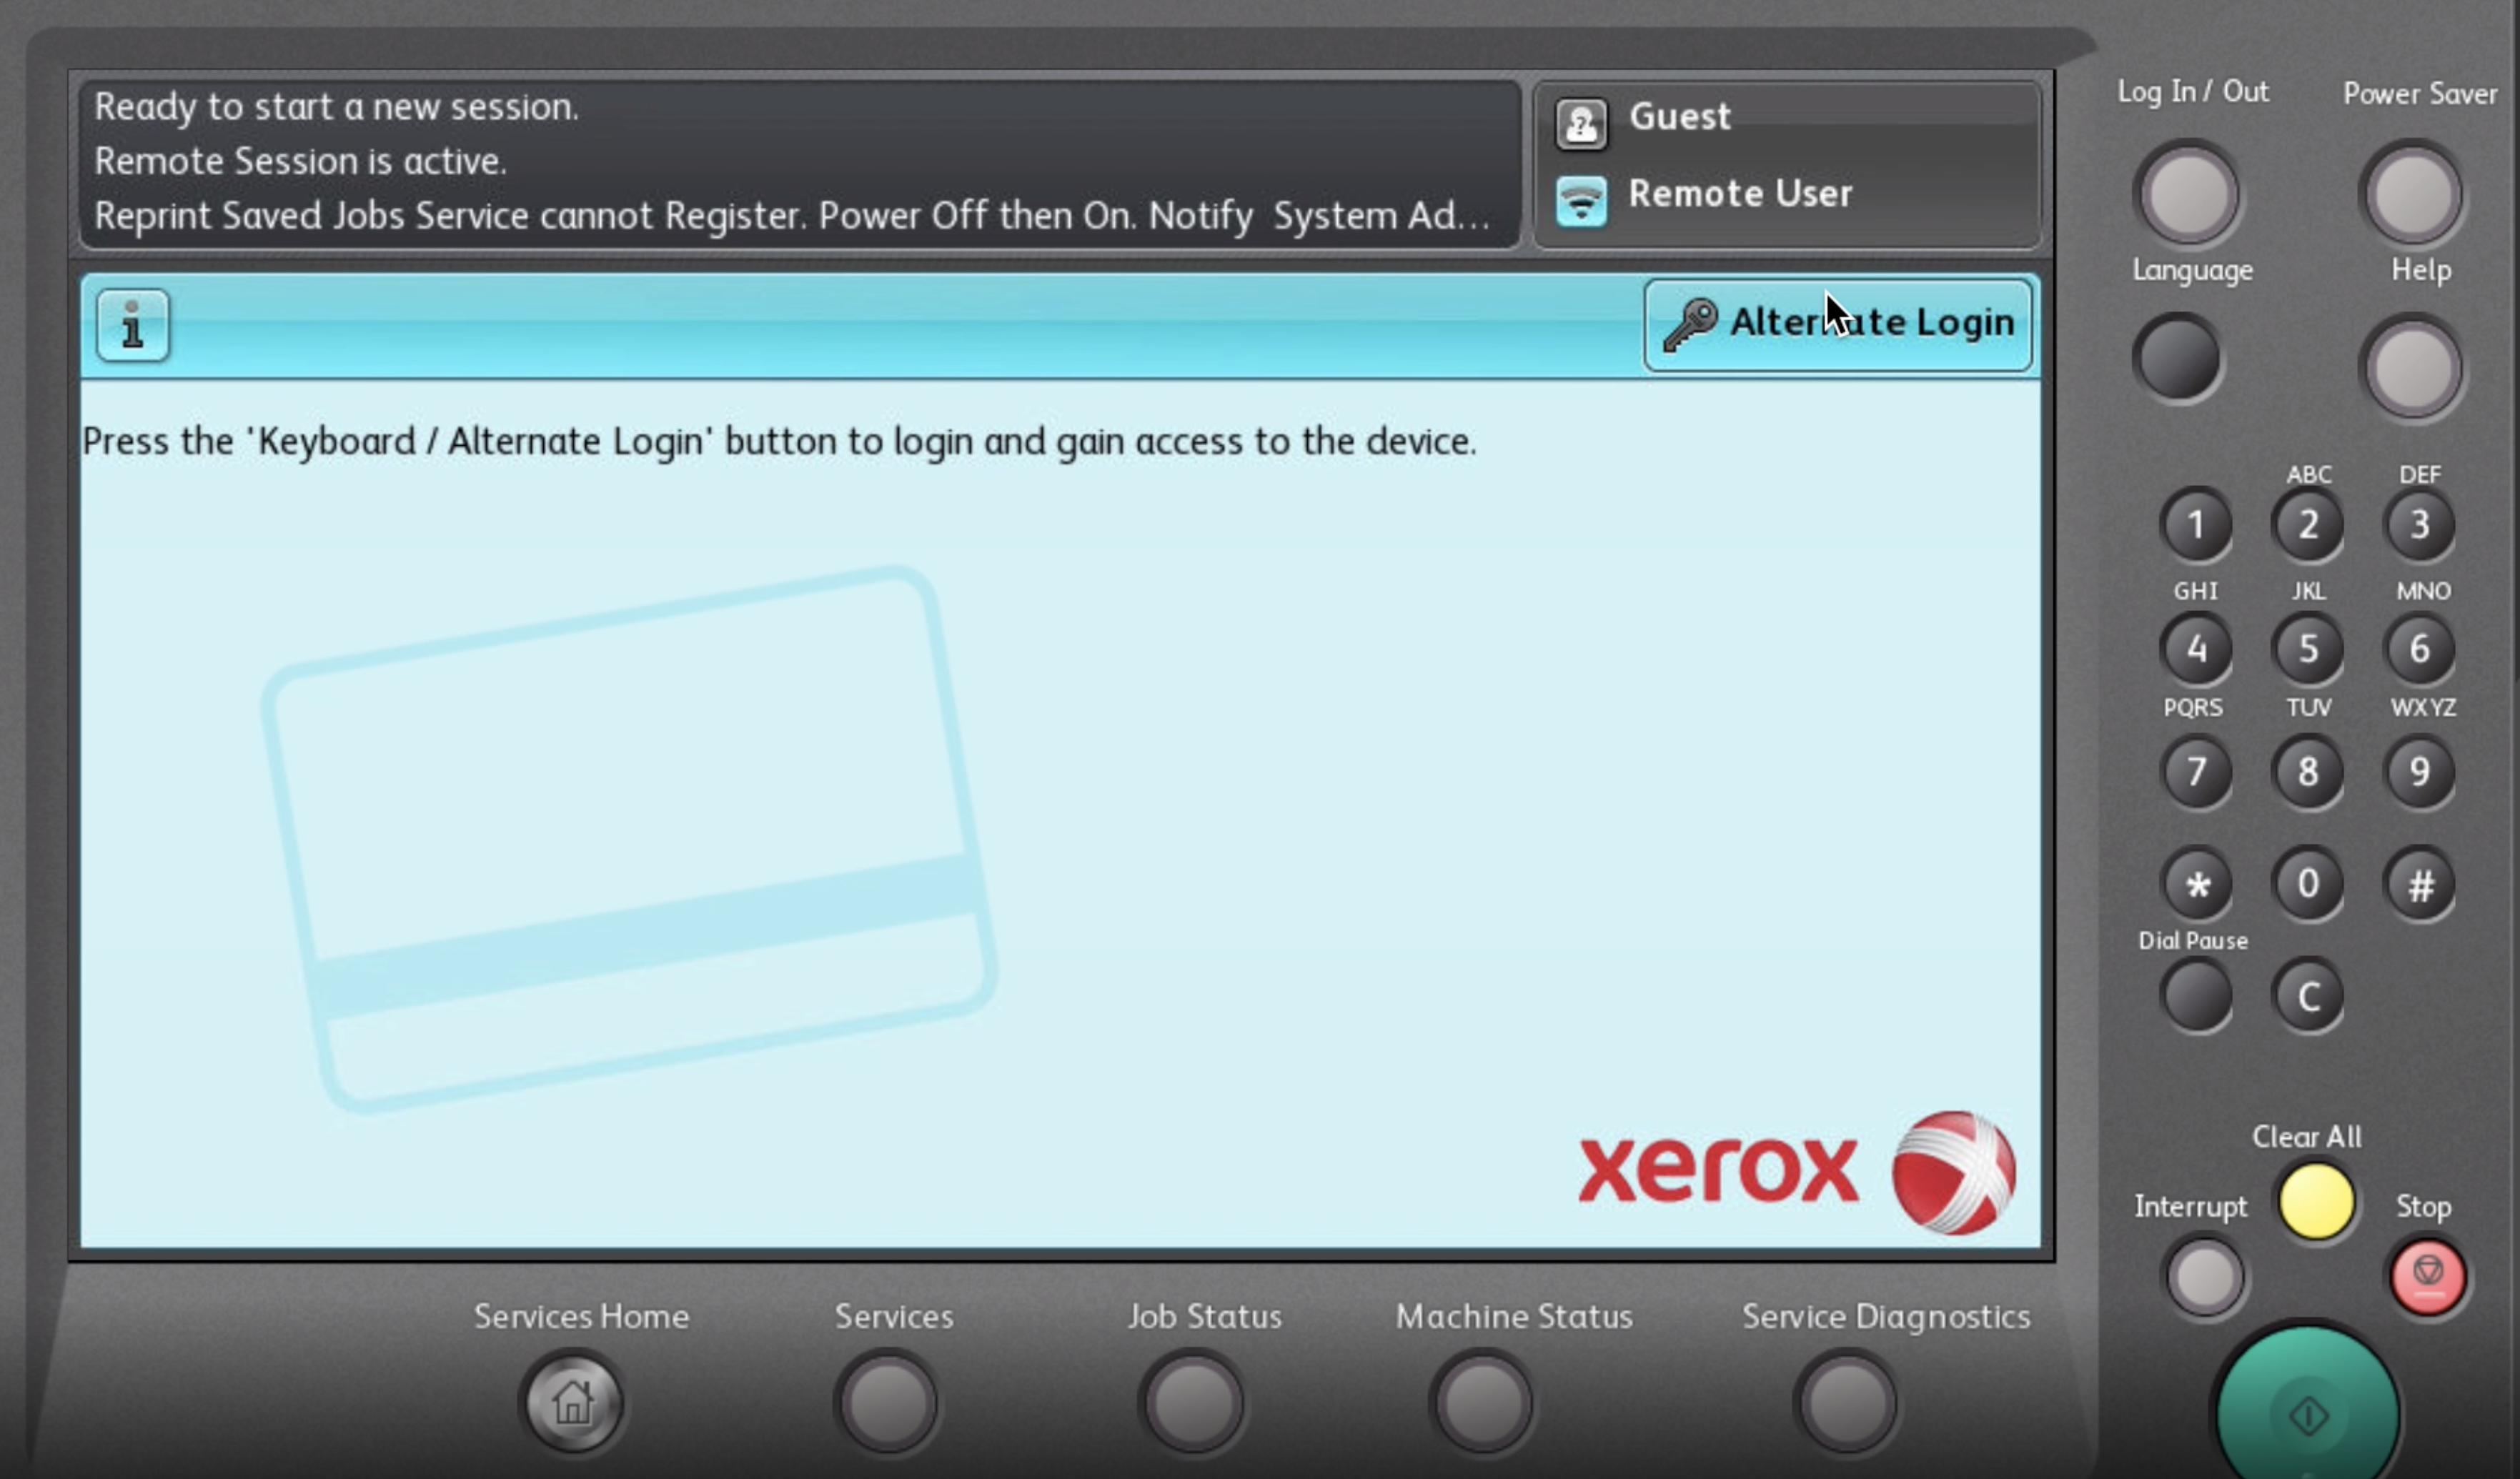 Xerox embedded app for PaperCut Hive App